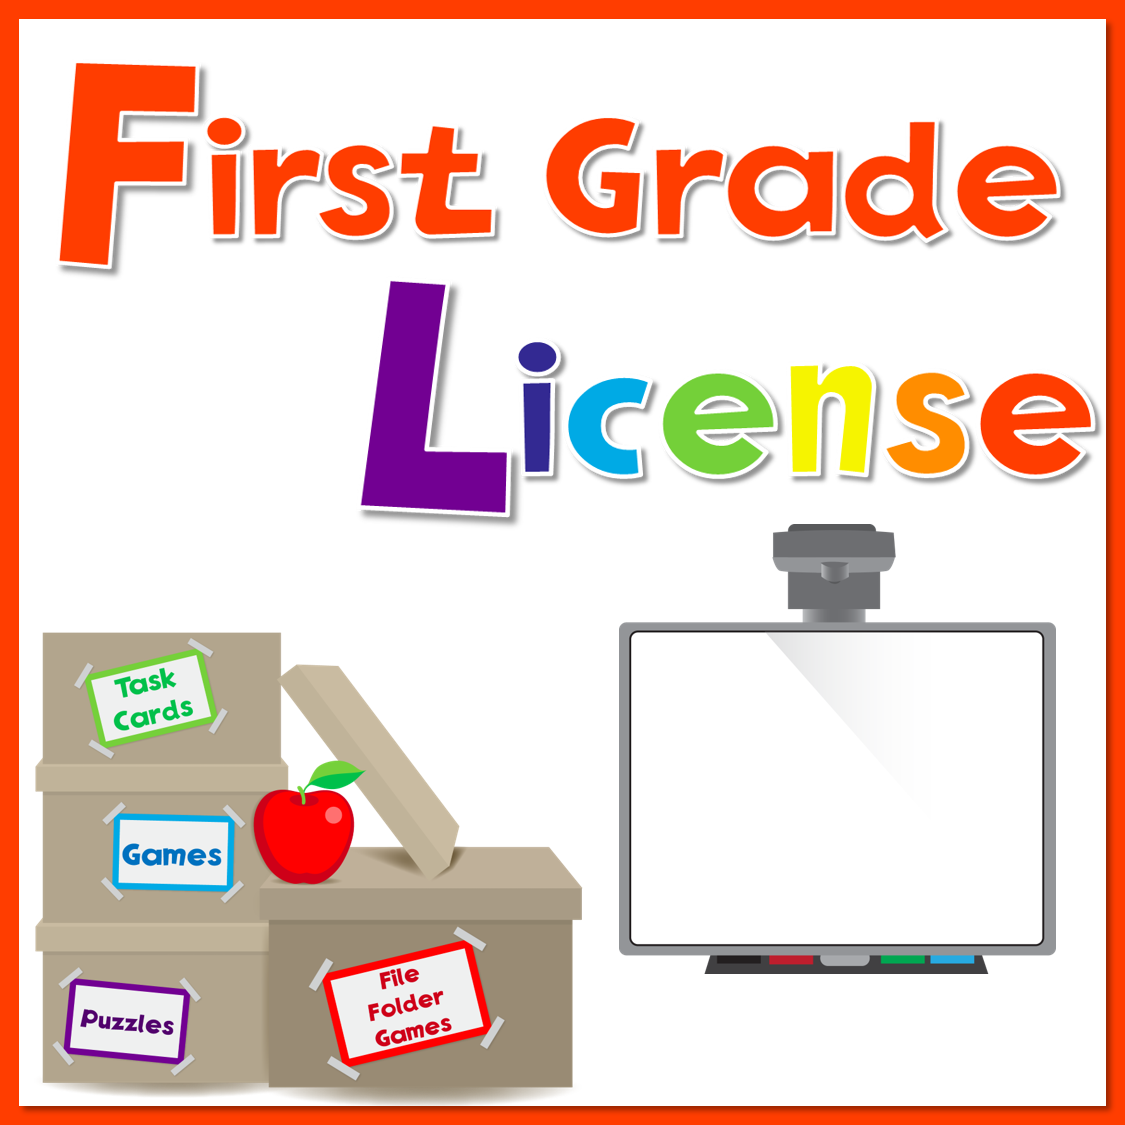 1st Grade License